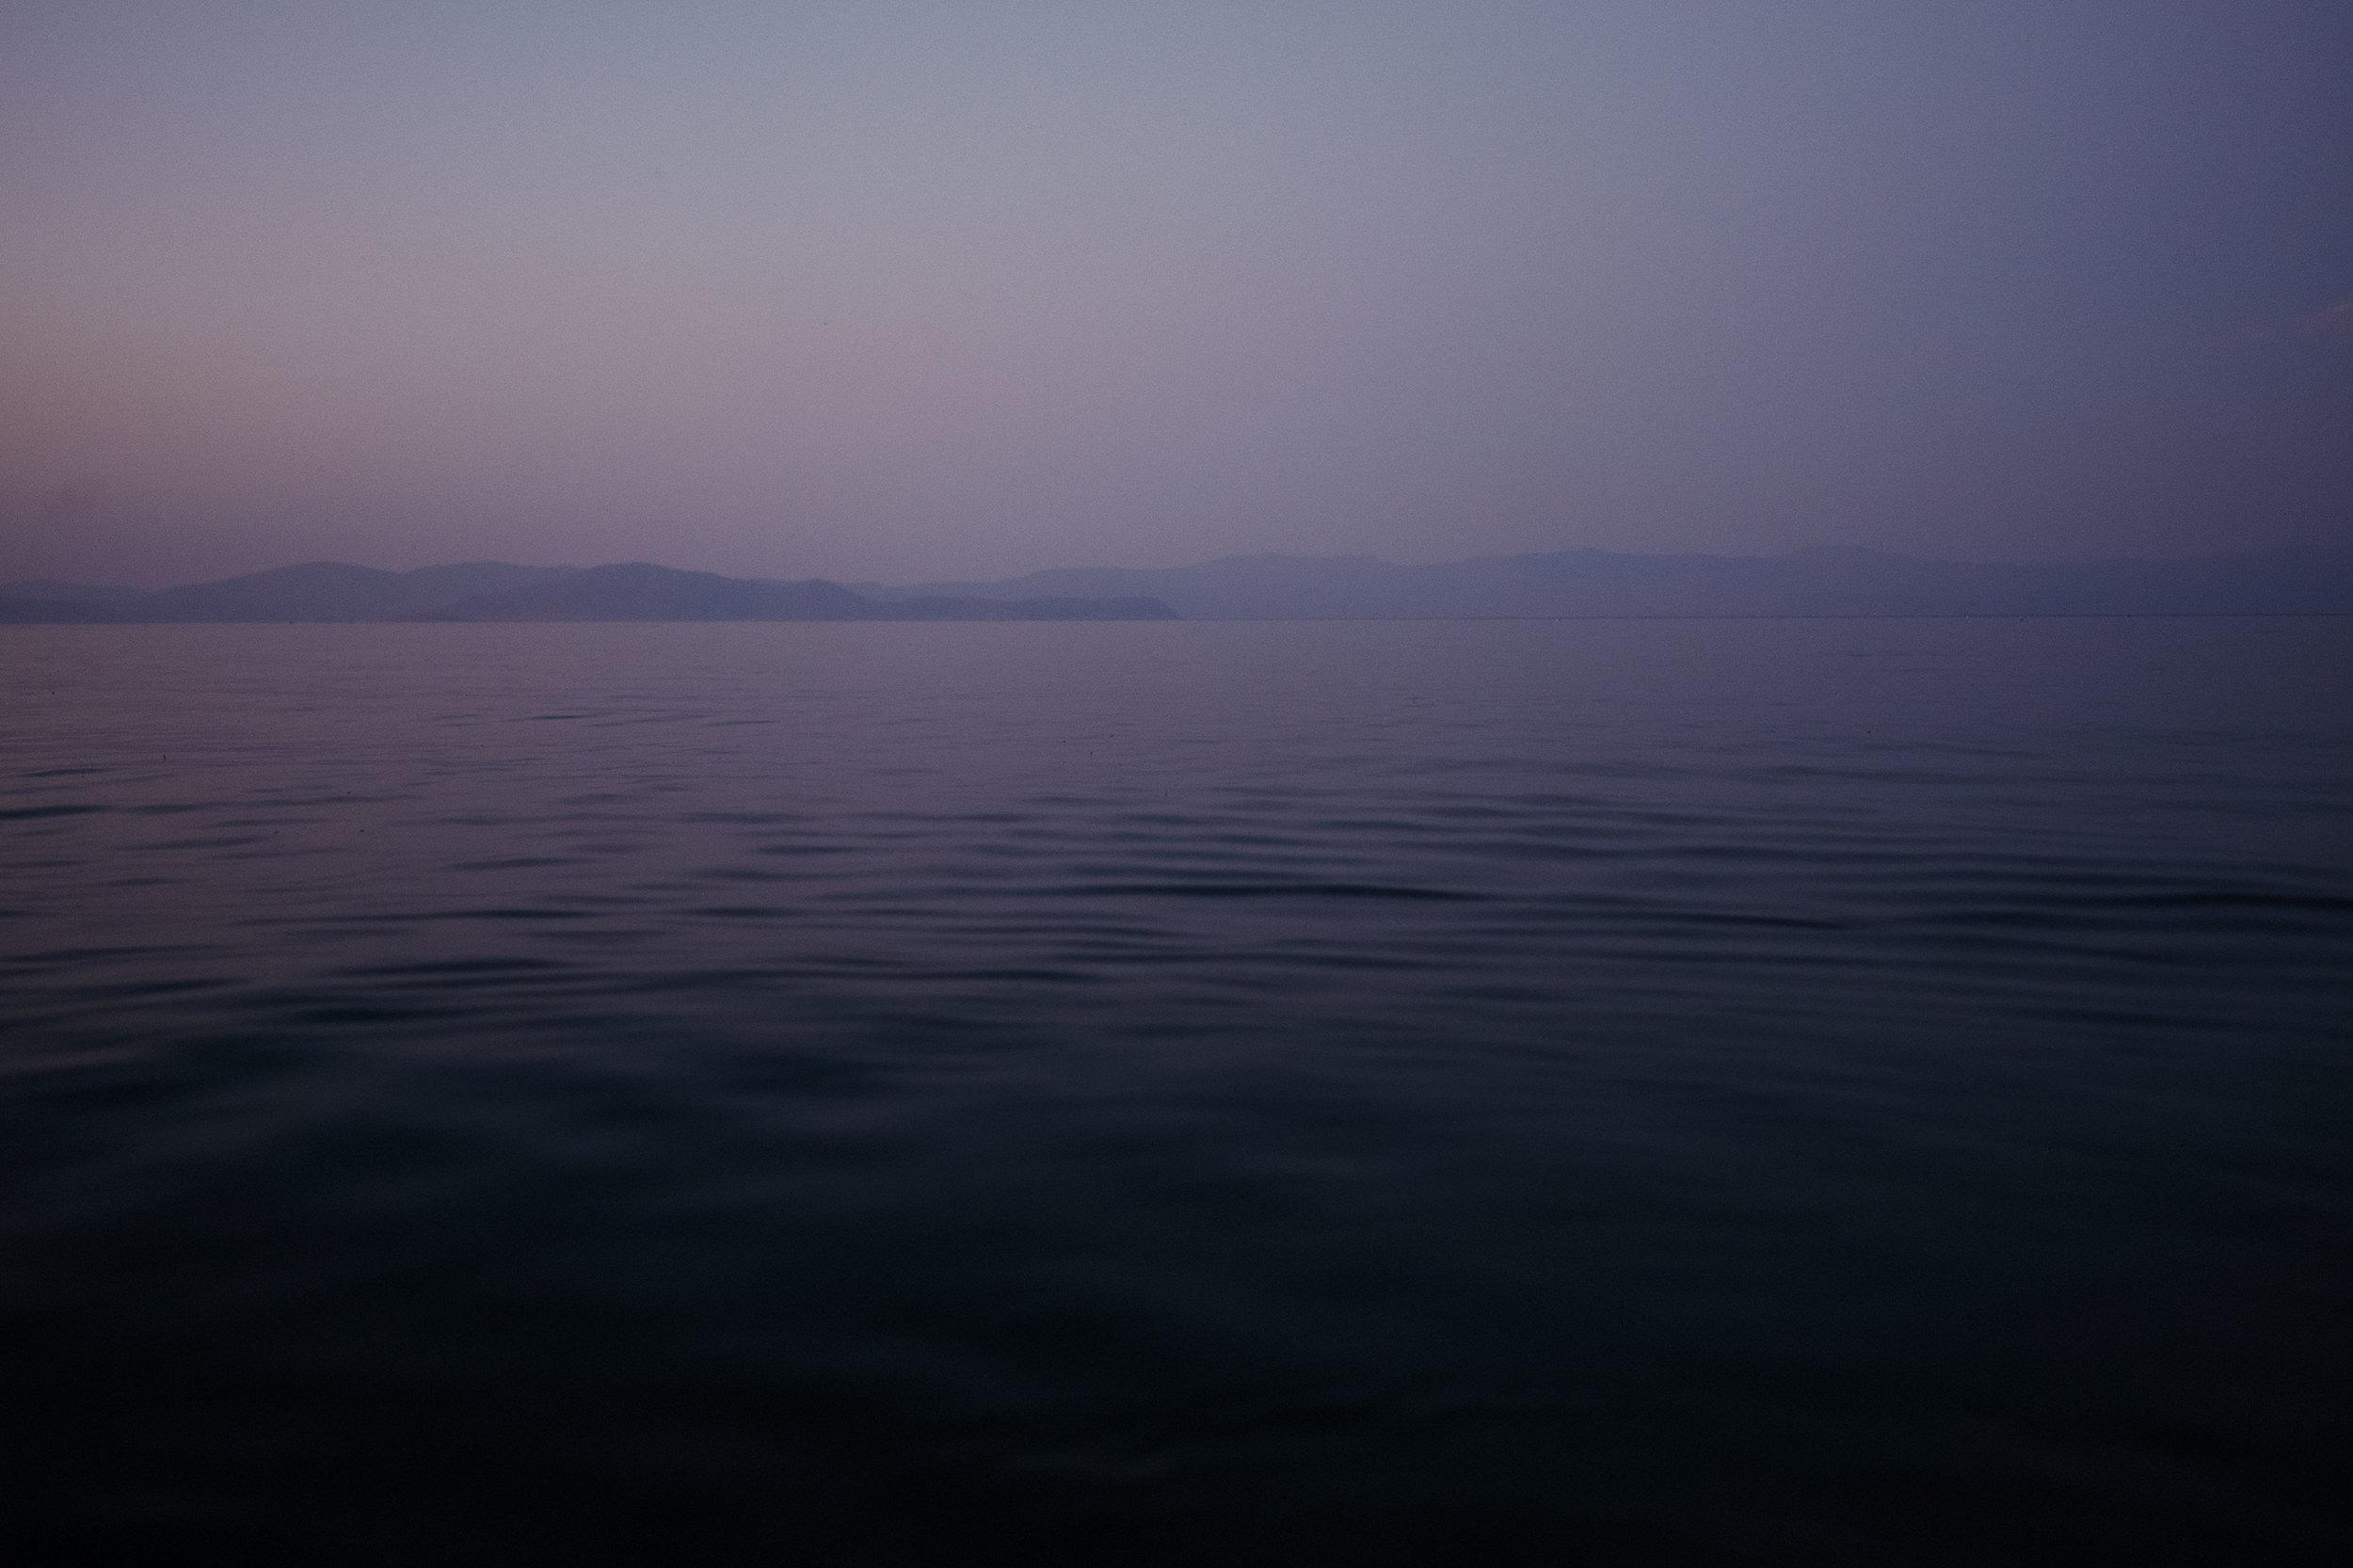 Armenia-Lake-Sevan-quiet